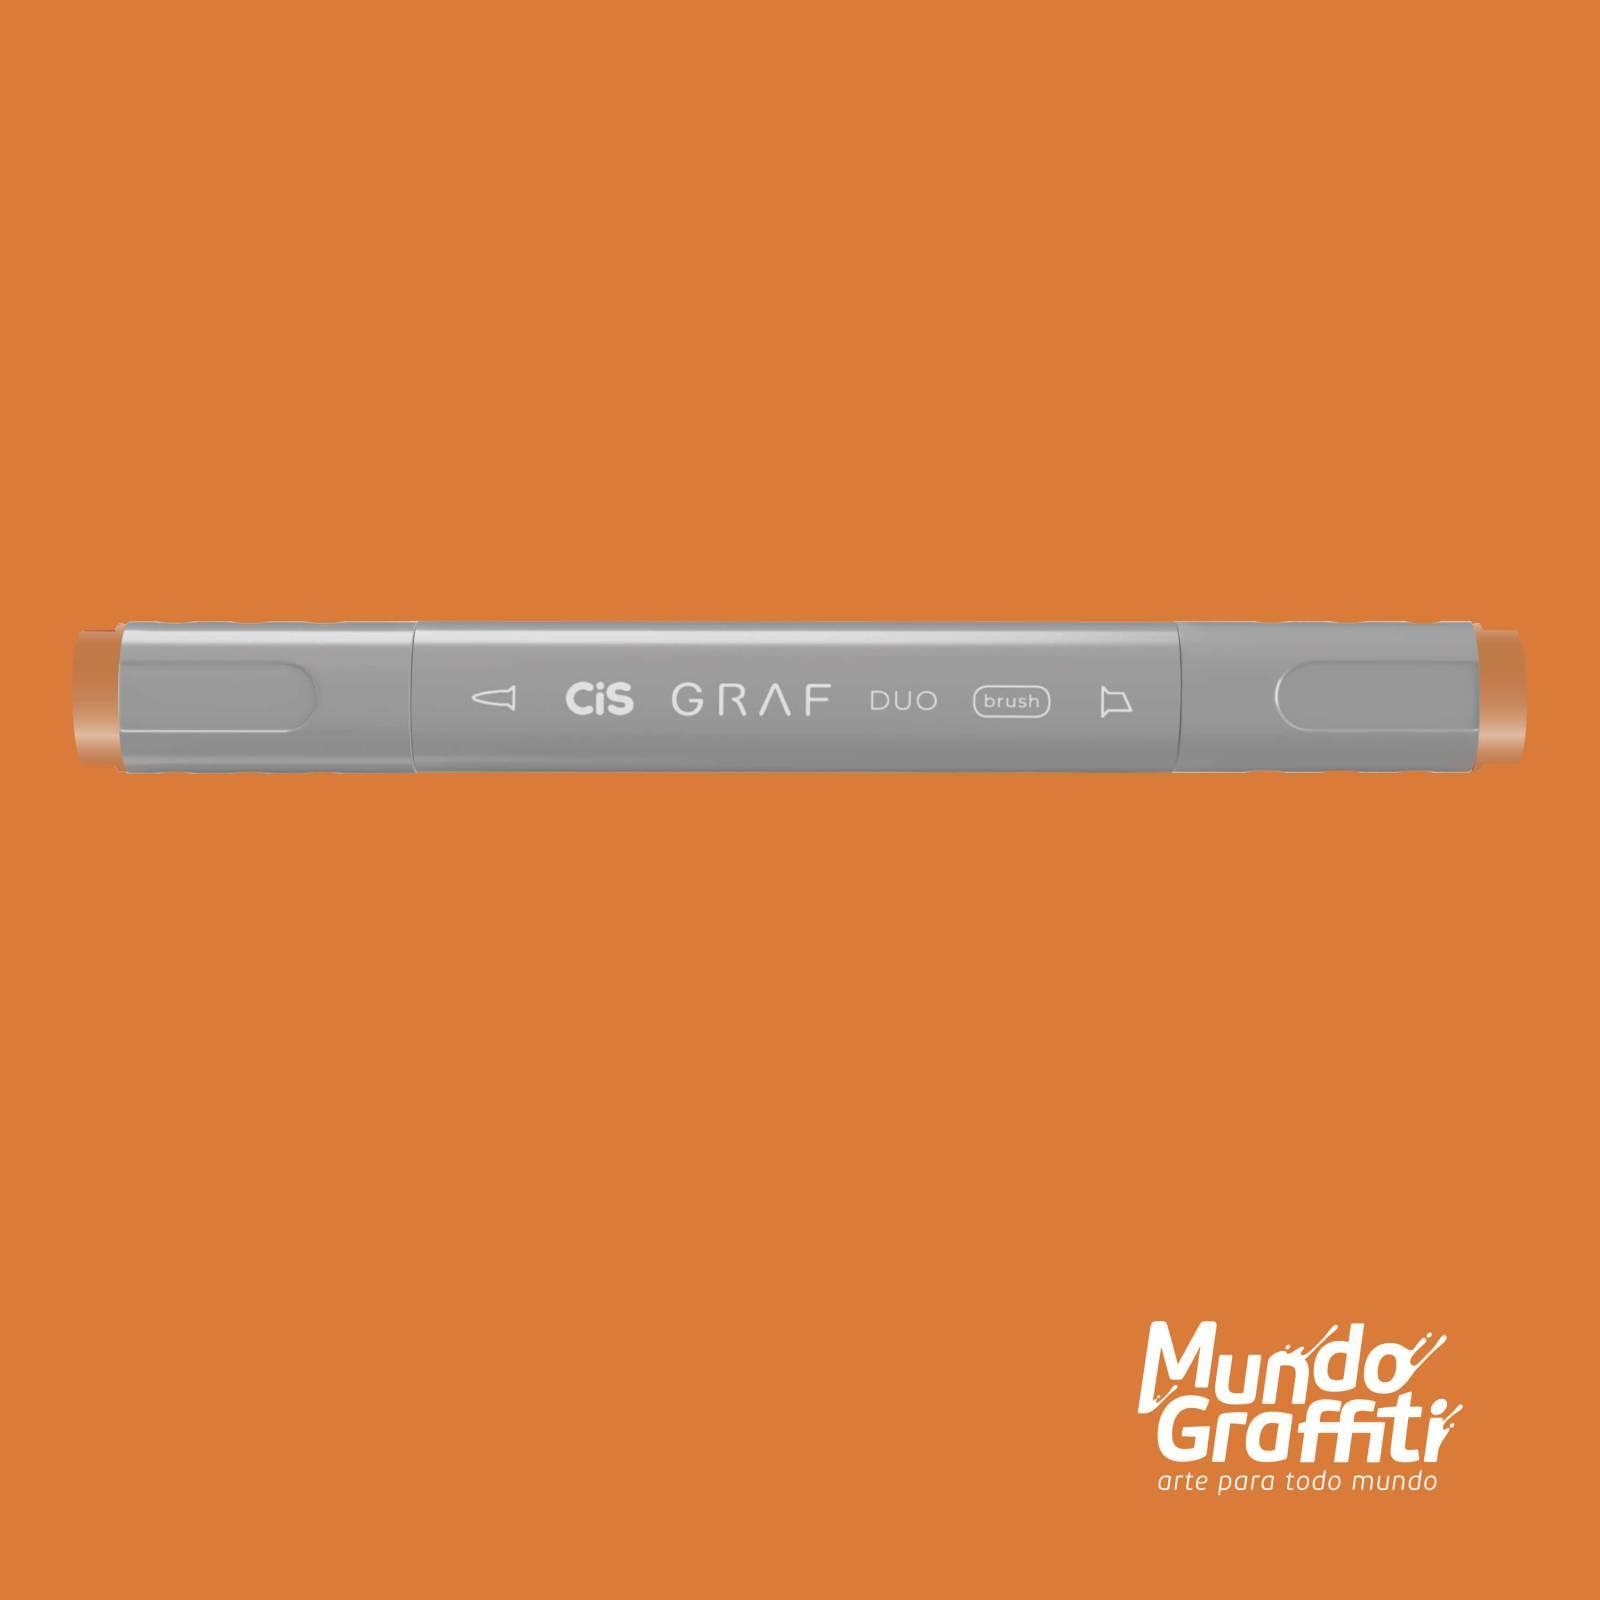 Marcador Cis Graf Duo Brush Terra Cotta 21 - Mundo Graffiti